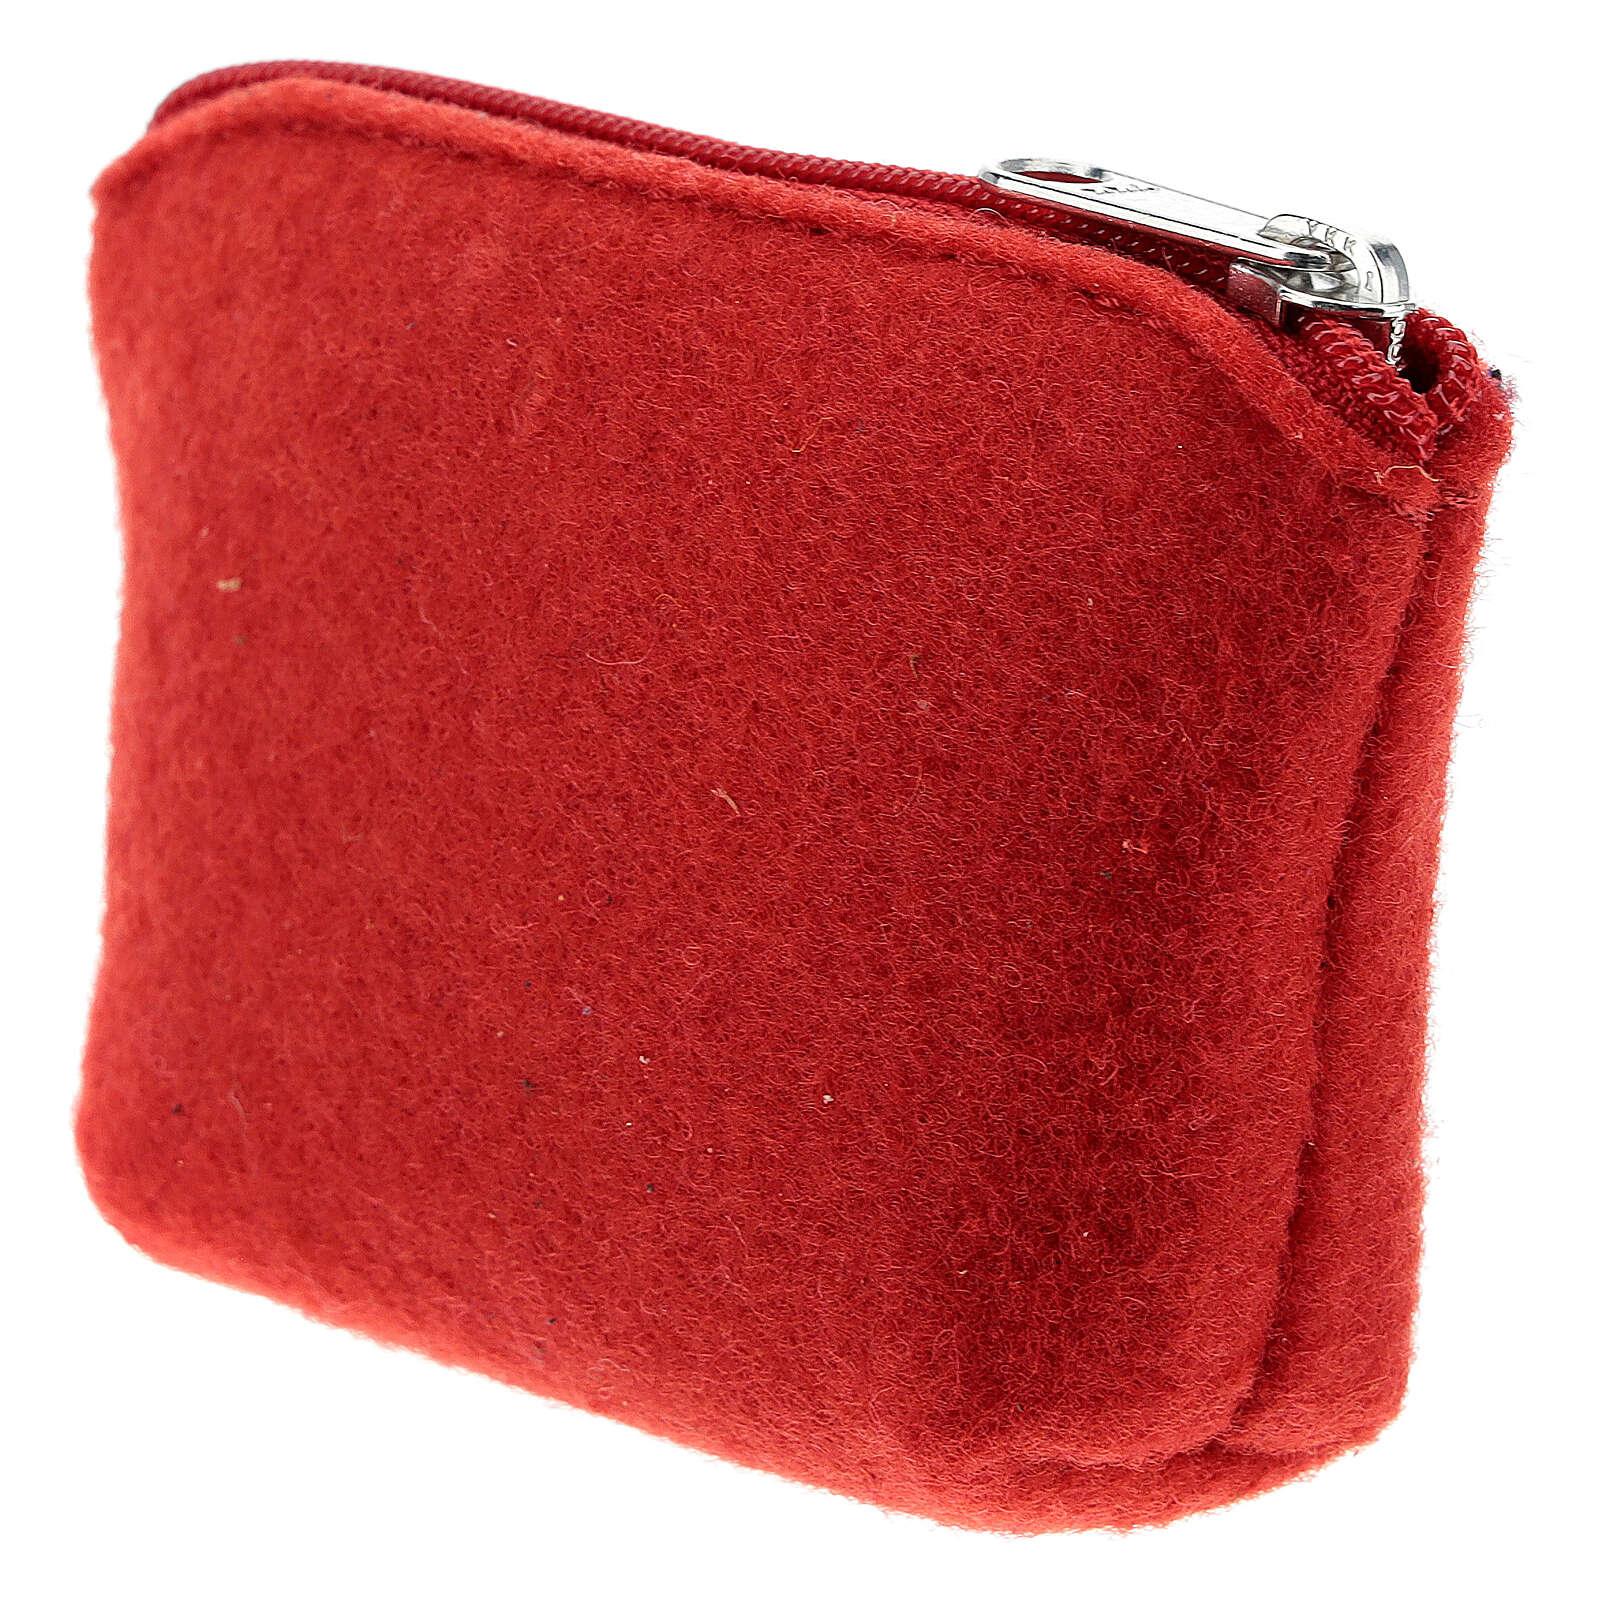 Astuccio portarosario feltro rosso Divina Misericordia 7x10x3 4